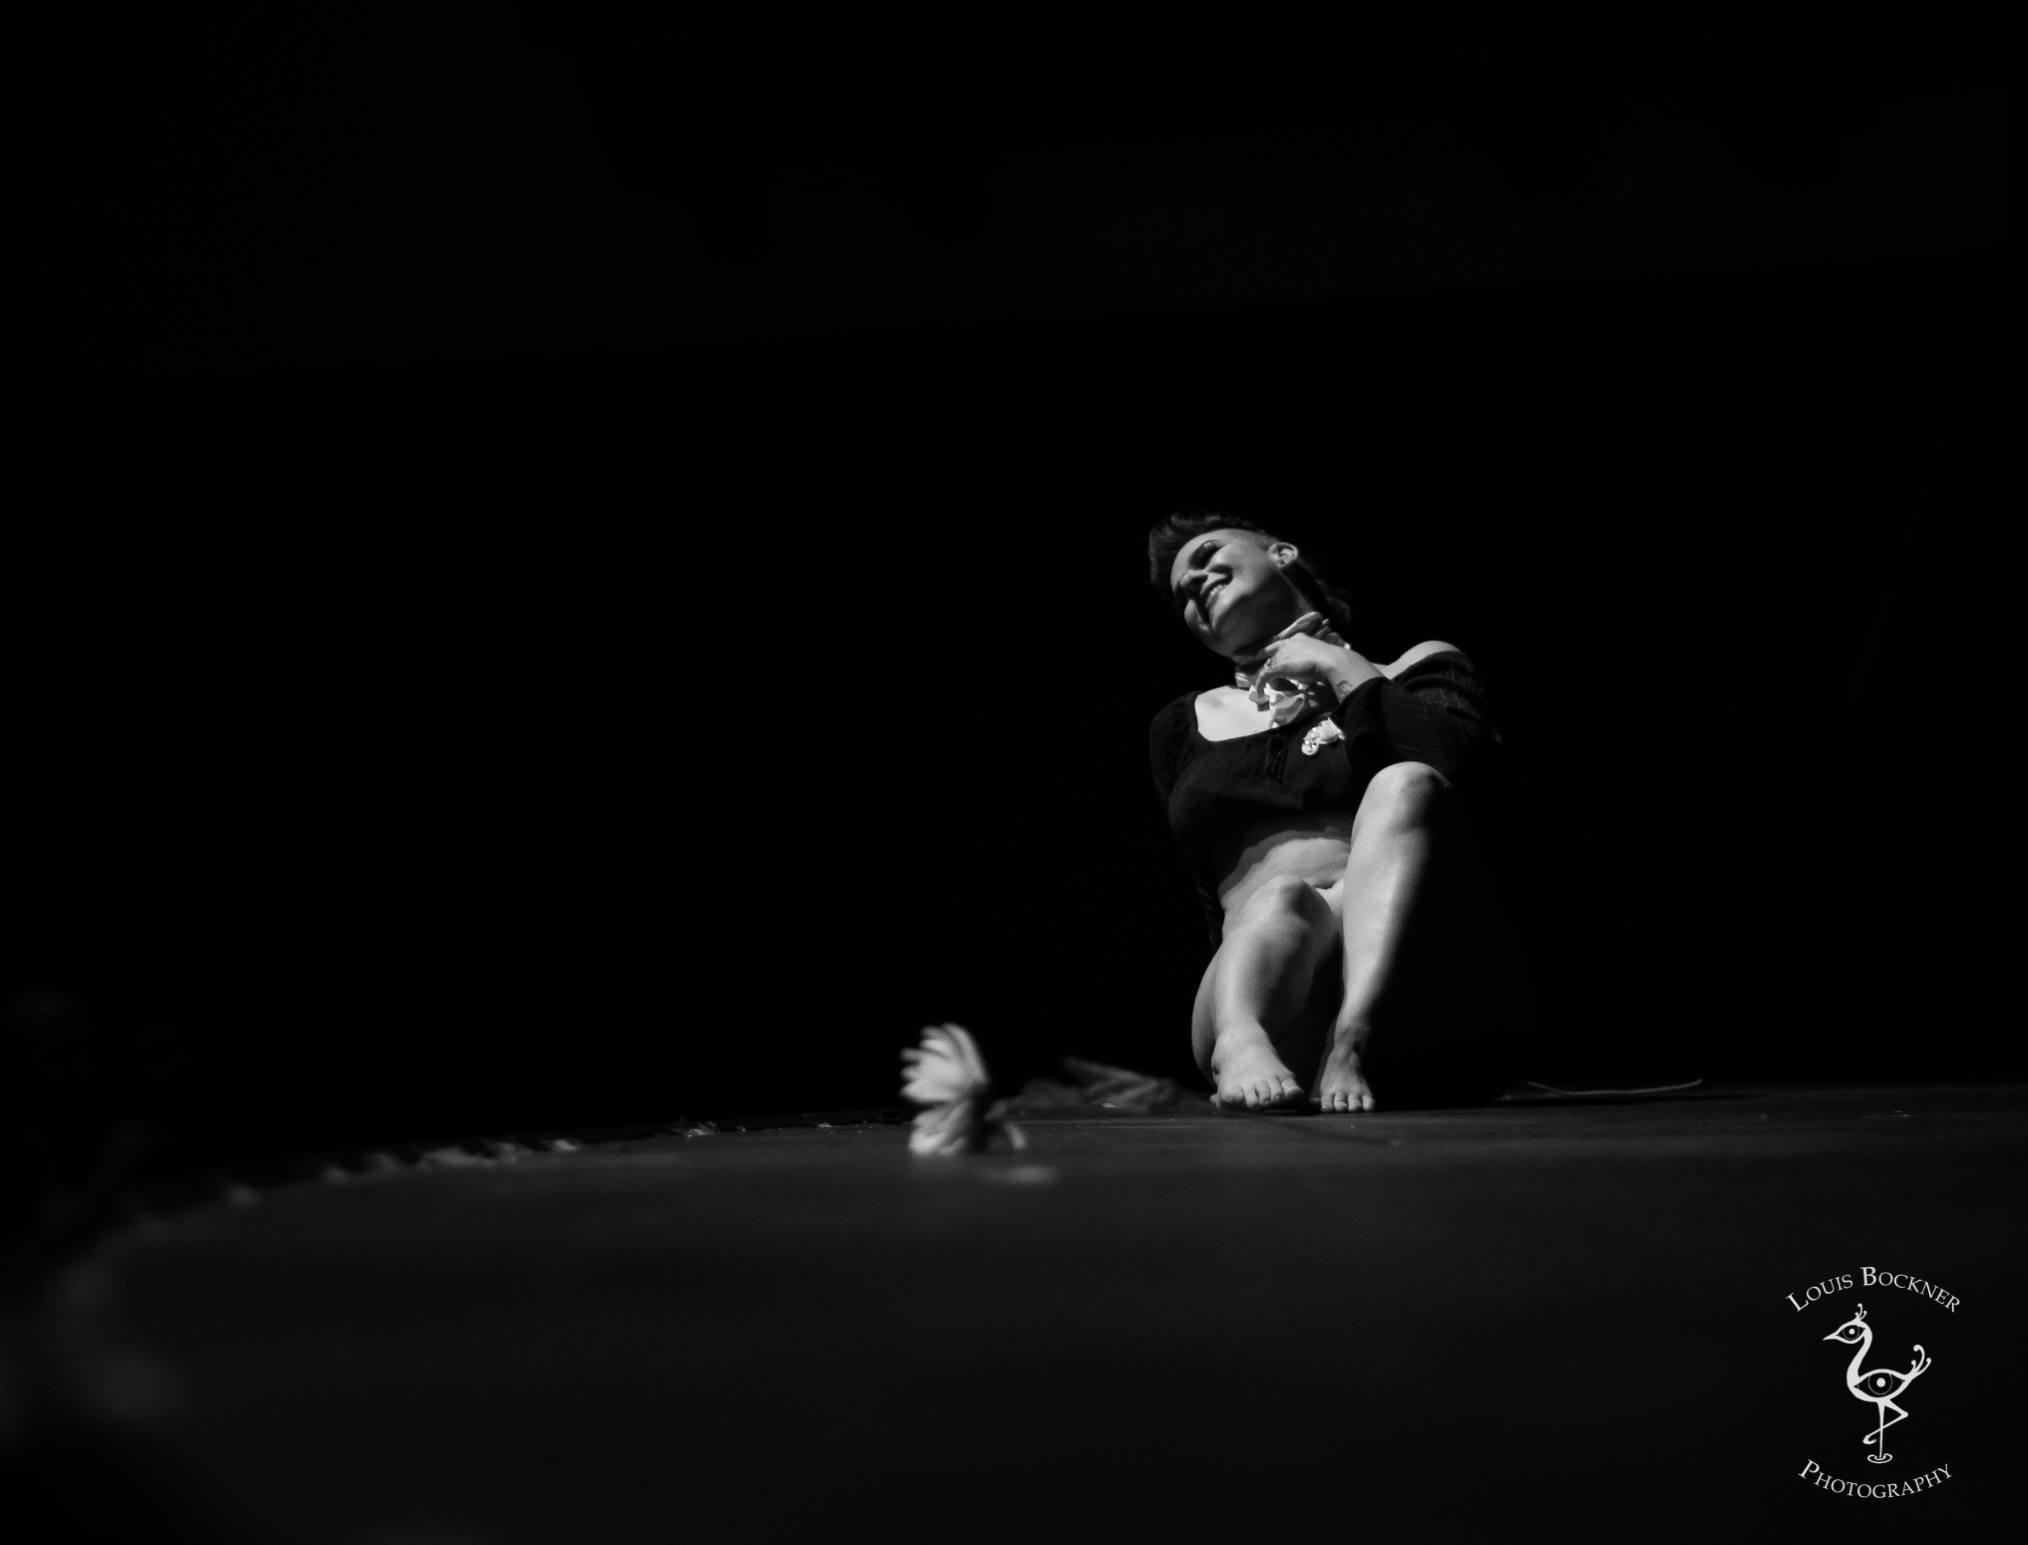 Photo: Louis Bockner Photography